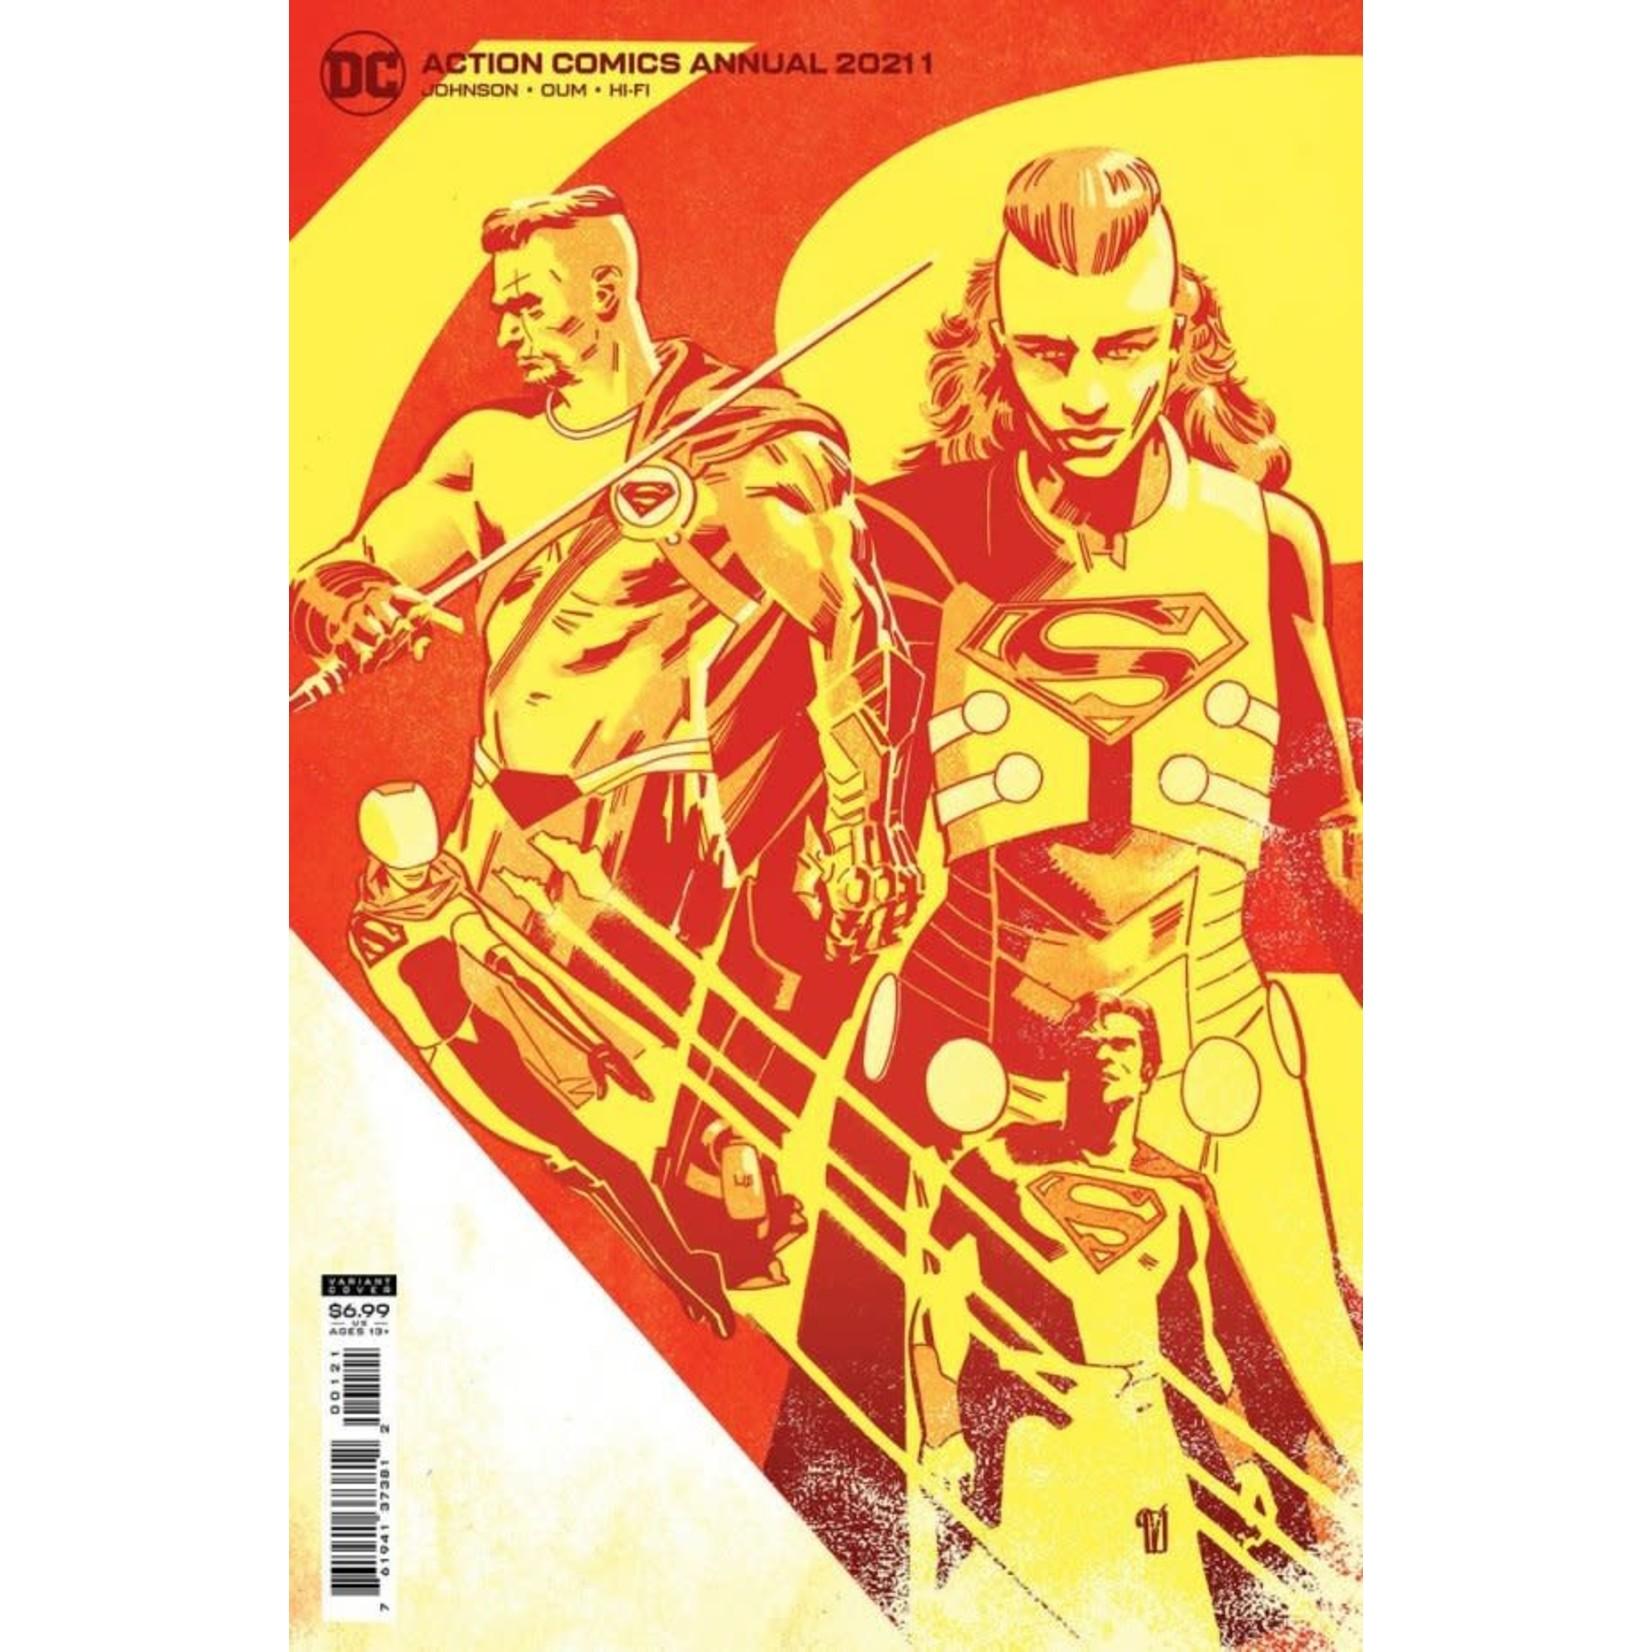 DC Comics Action Comics Annual 2021 Variant Cover